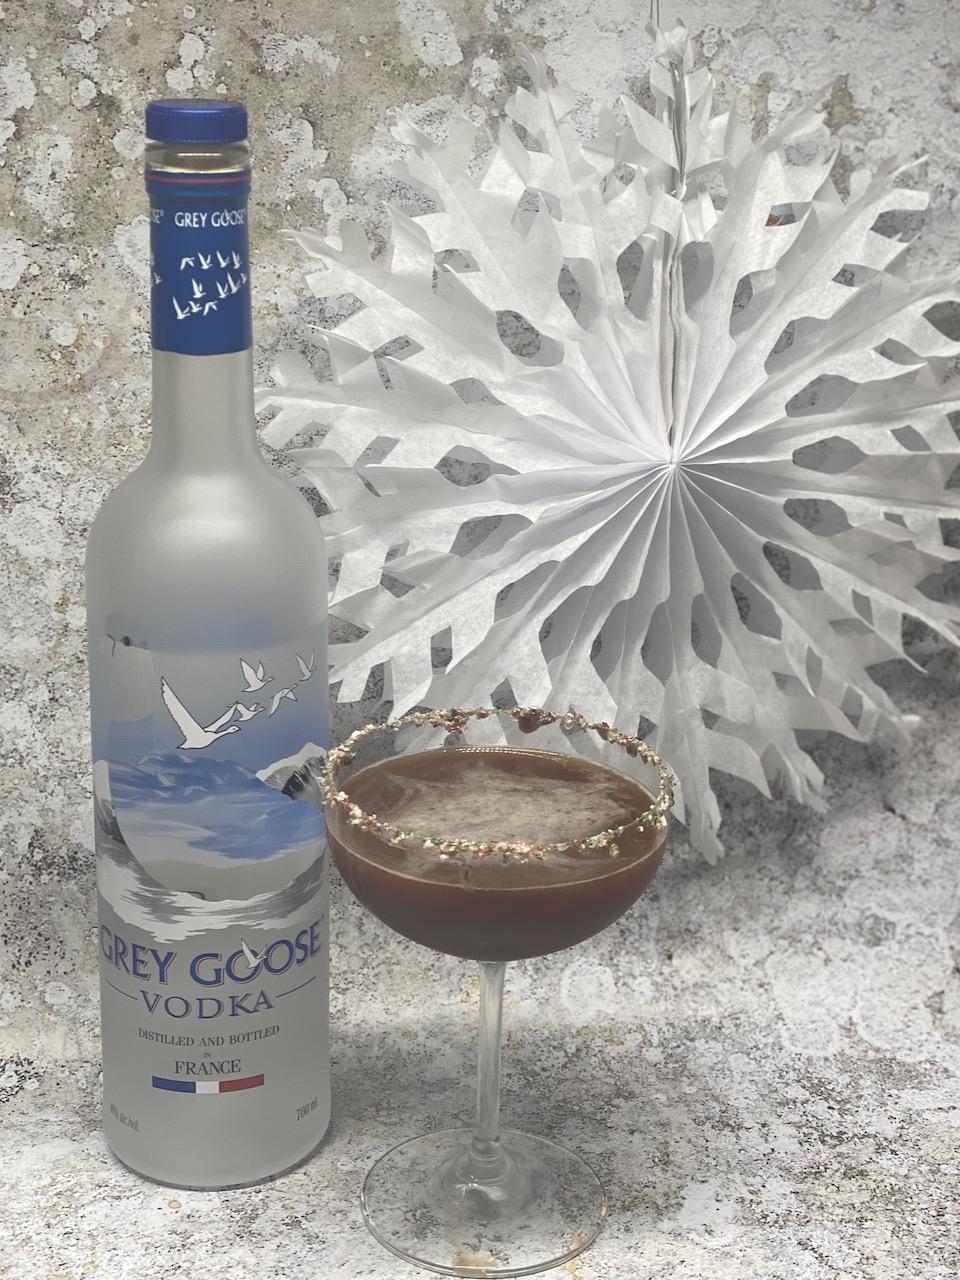 Giz n Green and Grey Goose - Cany Cane Espresso Martini